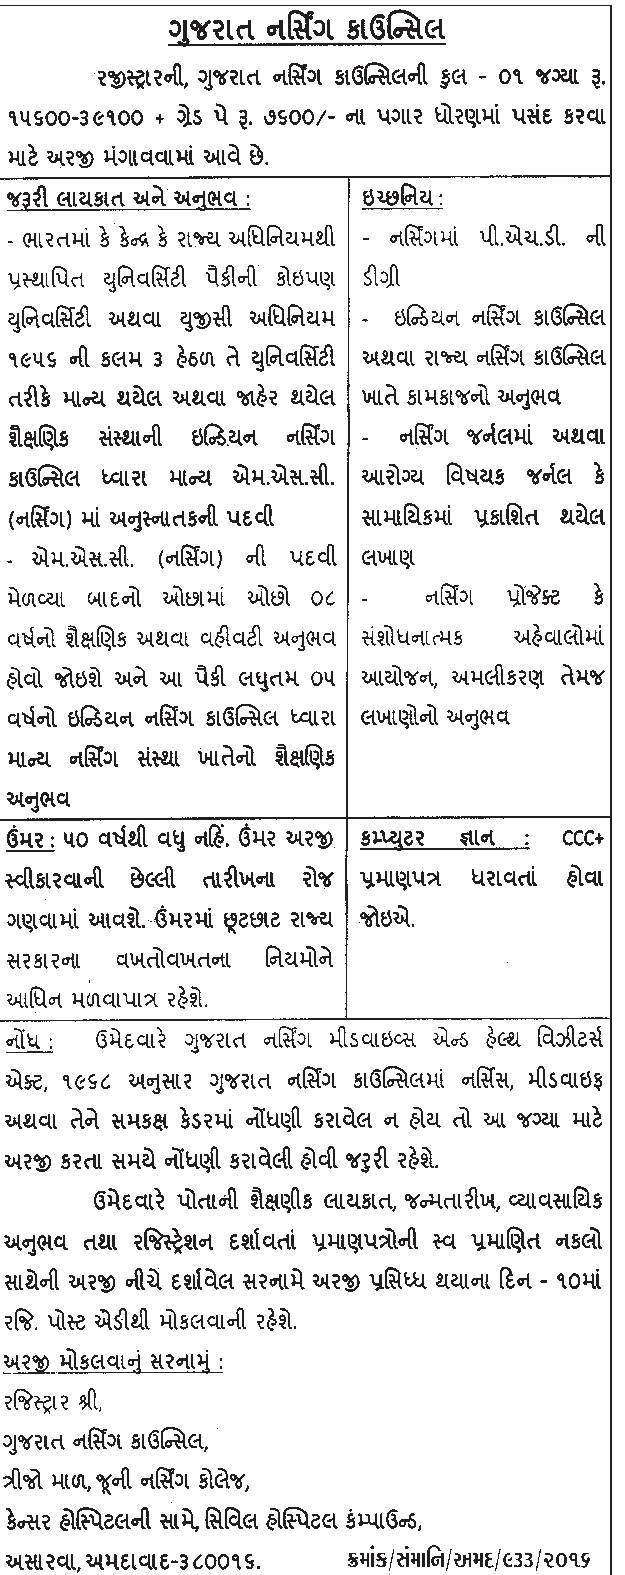 gujarat nursing council recruitment 2016 for registrar post